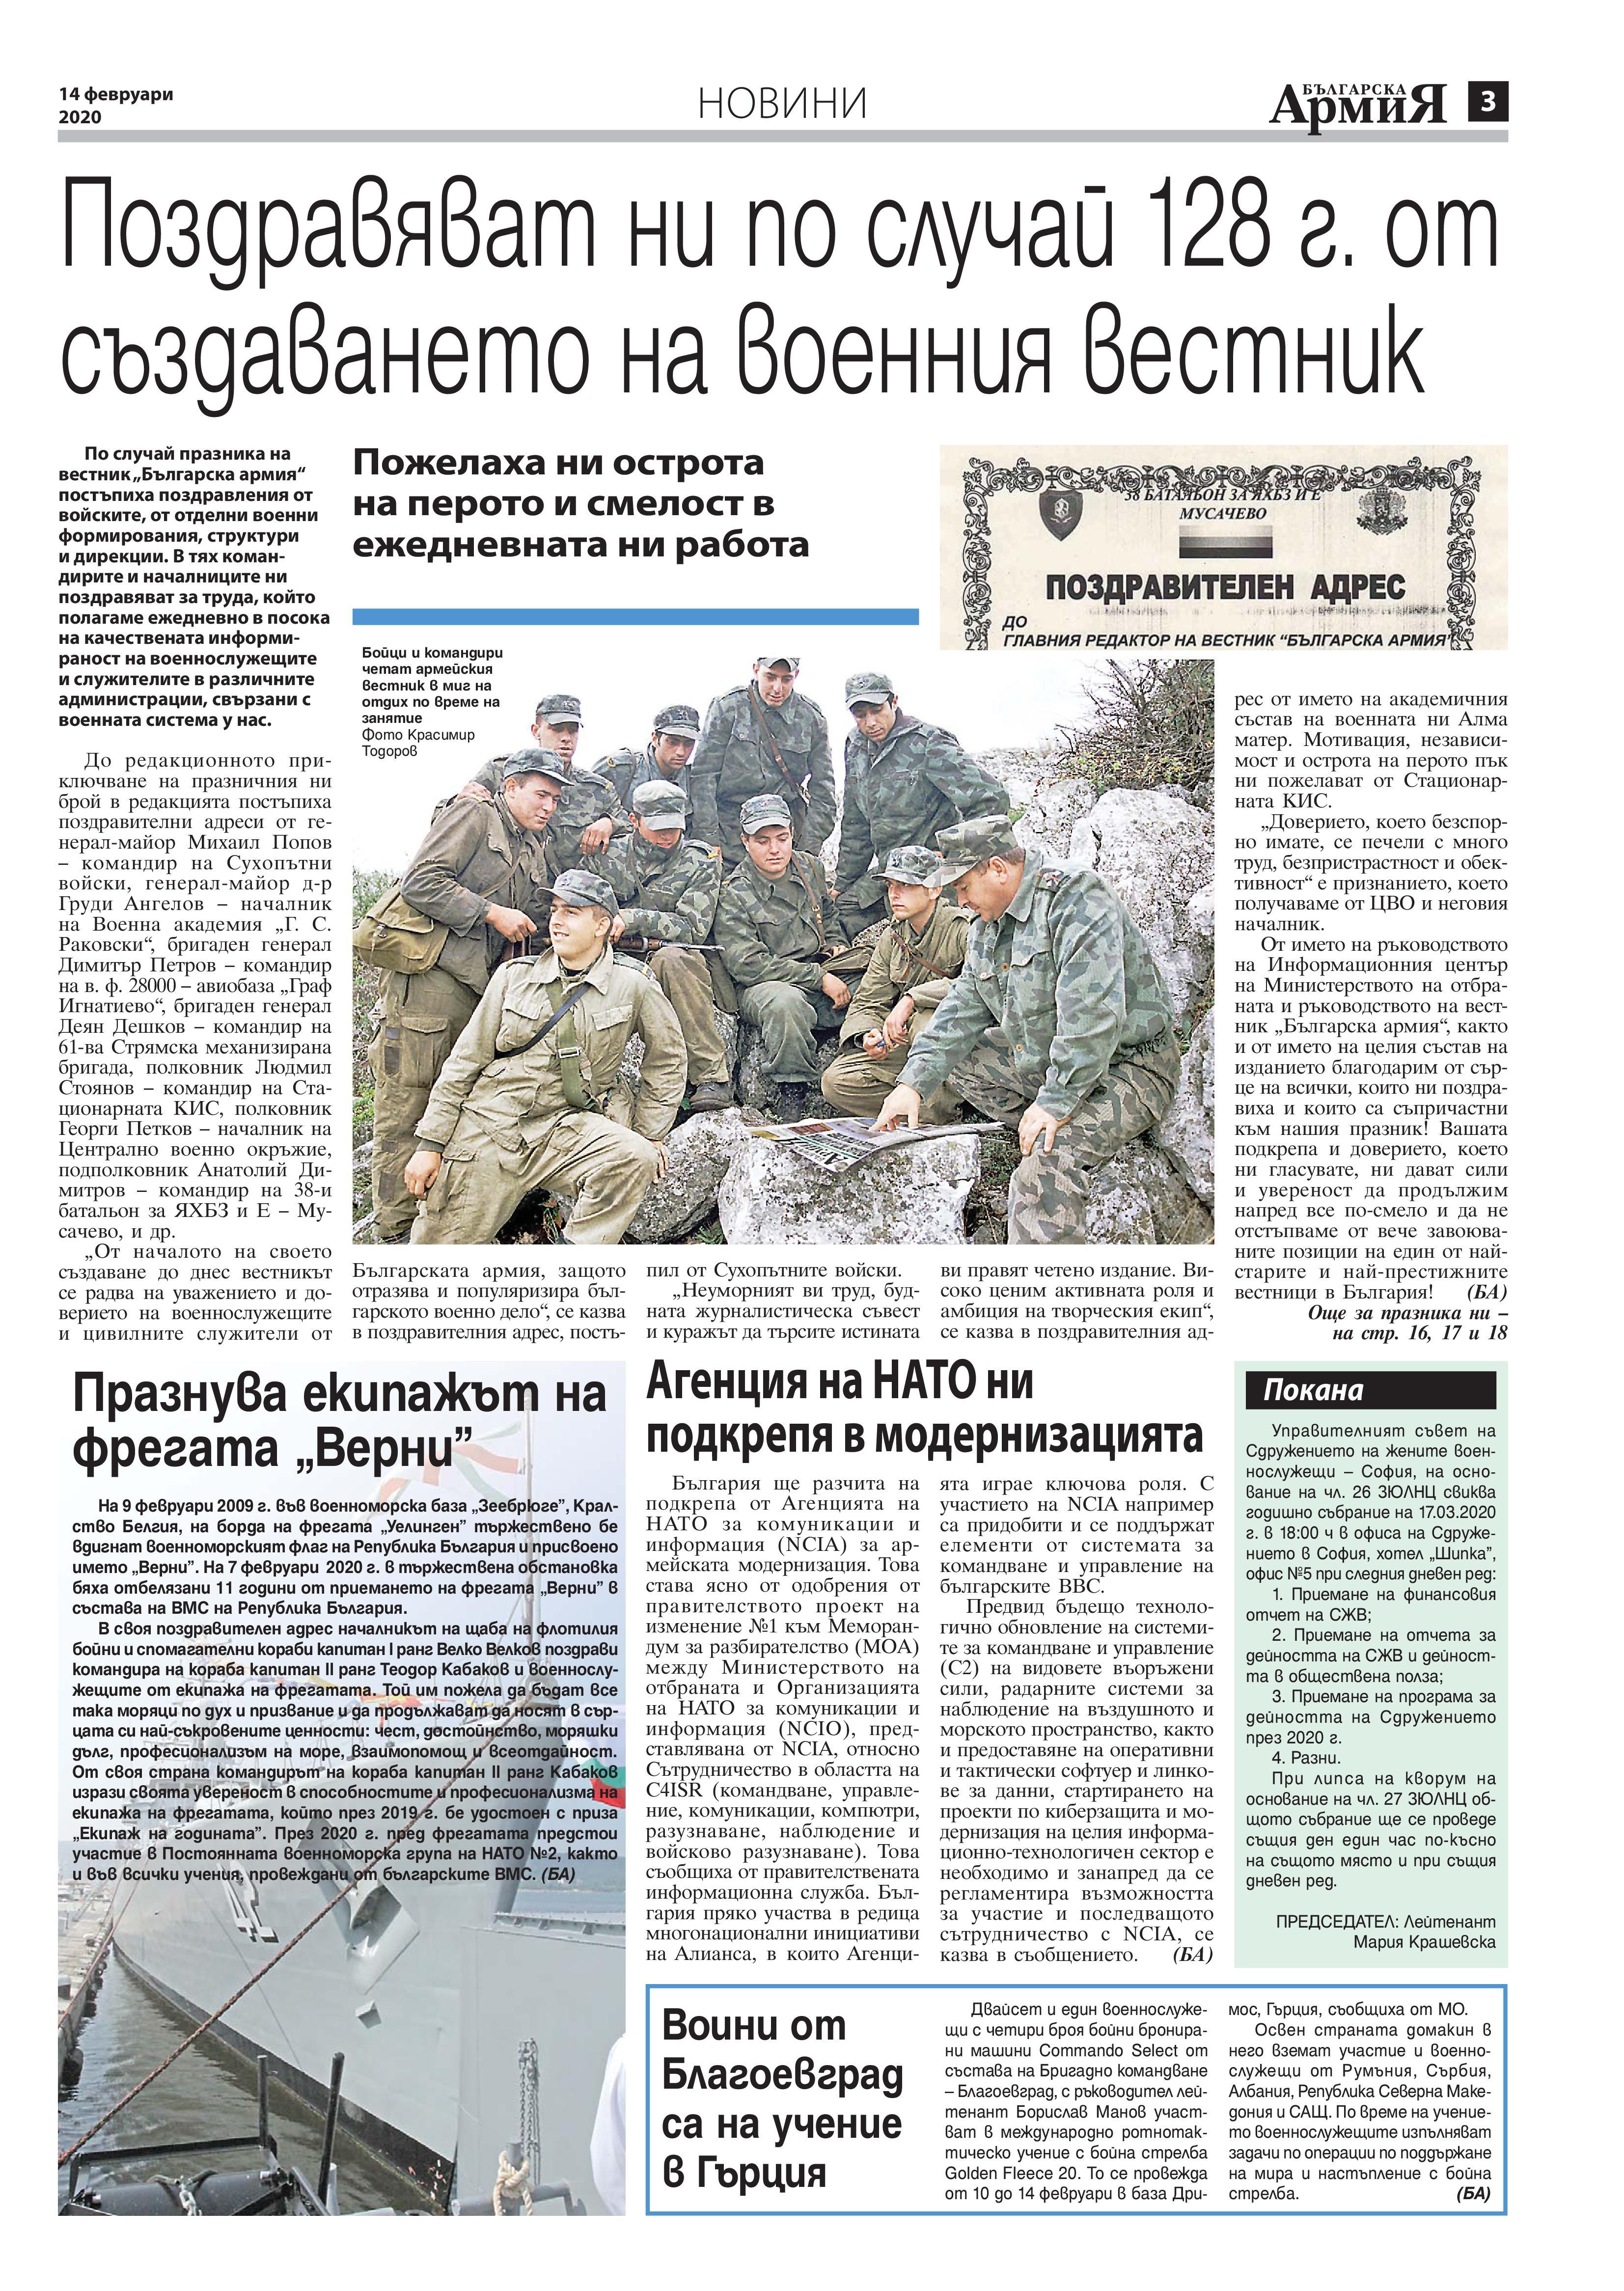 https://armymedia.bg/wp-content/uploads/2015/06/03-34.jpg